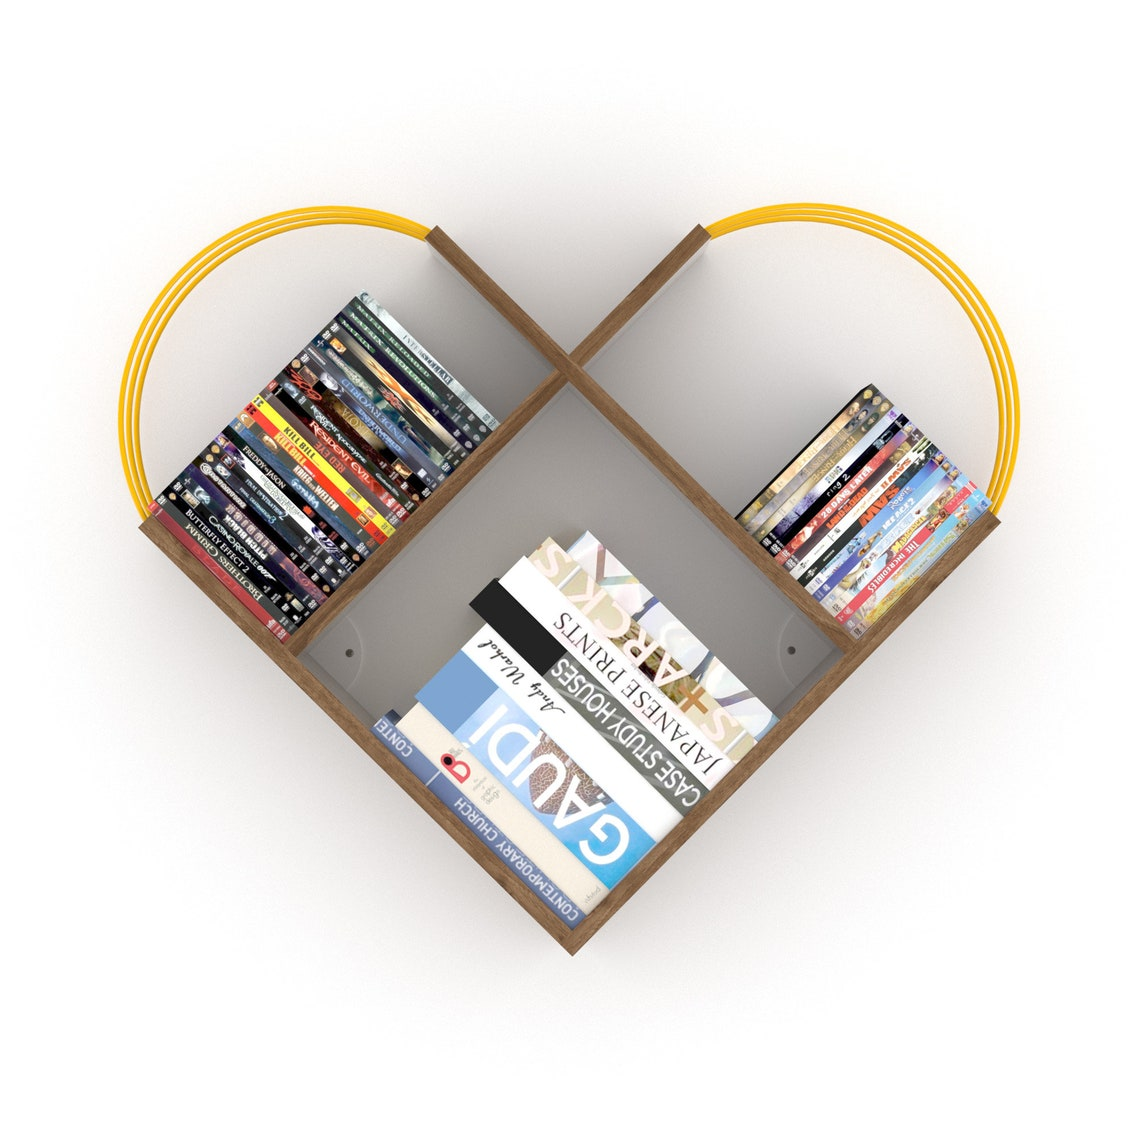 Case Wall Shelf Modern Design (Walnut-Yellow), Wall Book Case